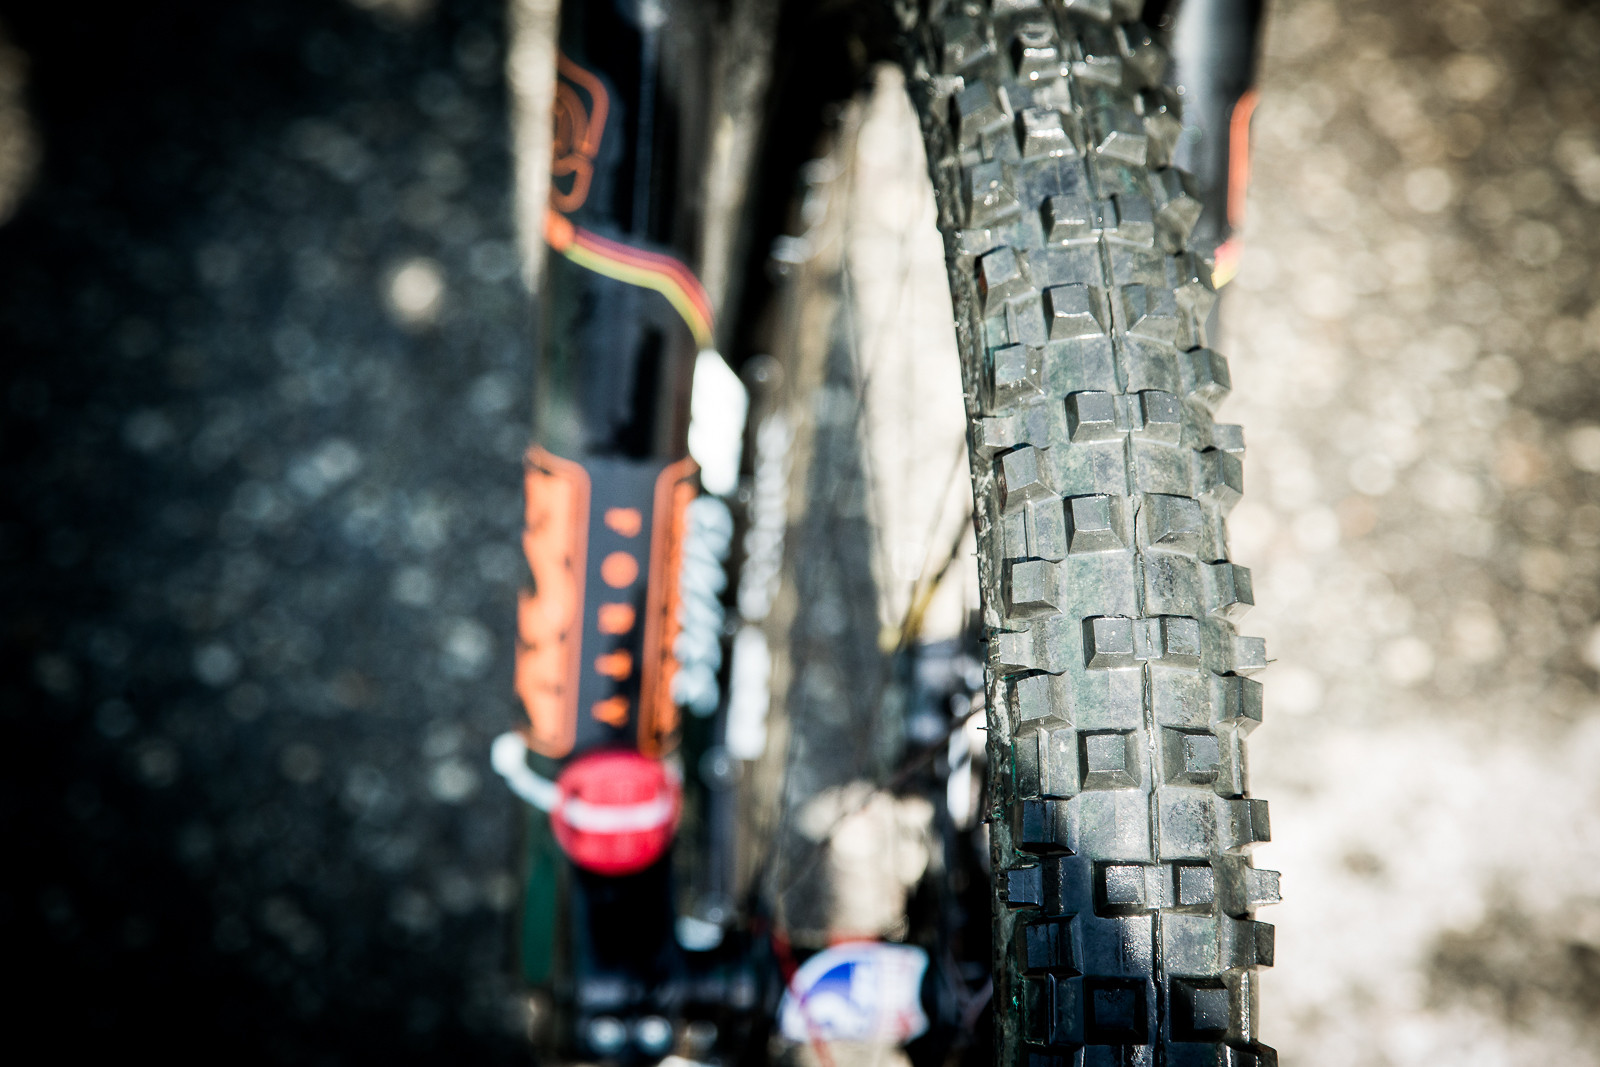 Fairclough Running Big Spike - PIT BITS - World Cup Lenzerheide, Switzerland - Mountain Biking Pictures - Vital MTB